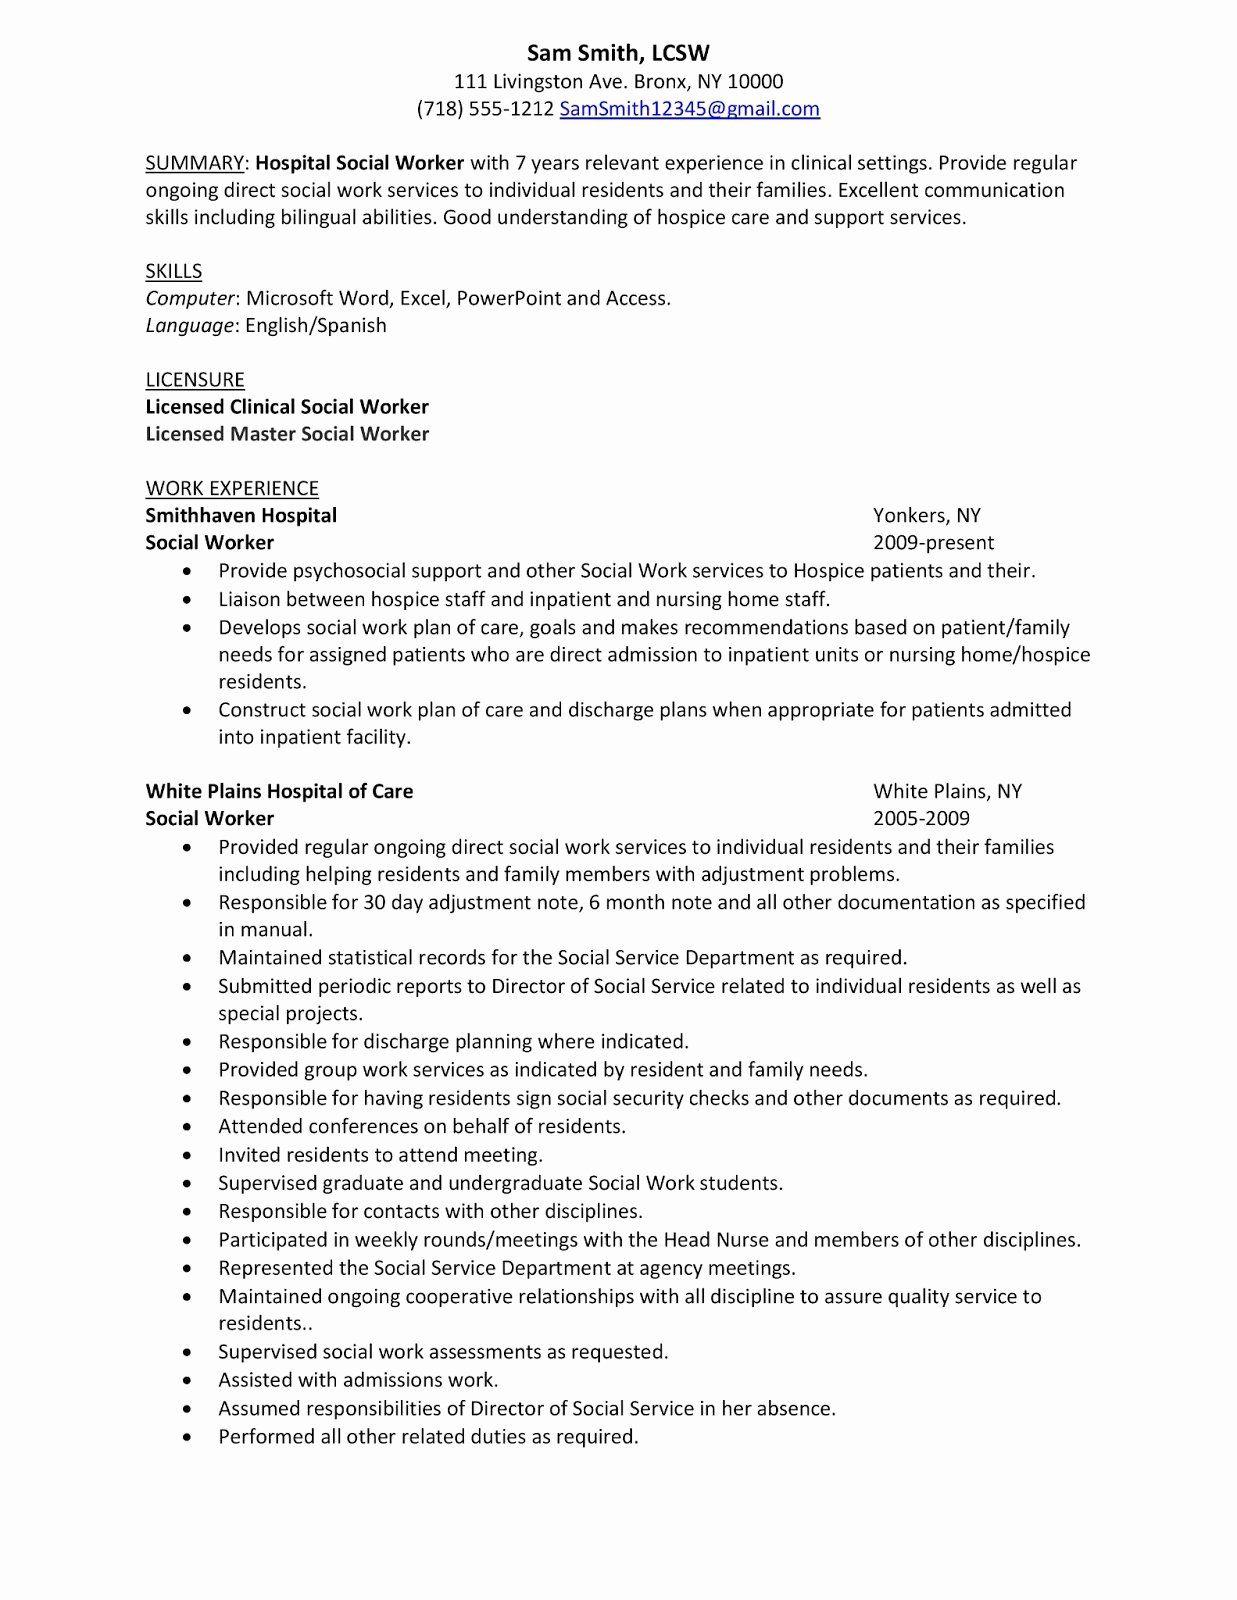 25 Entry Level social Work Resume in 2020 Resume summary